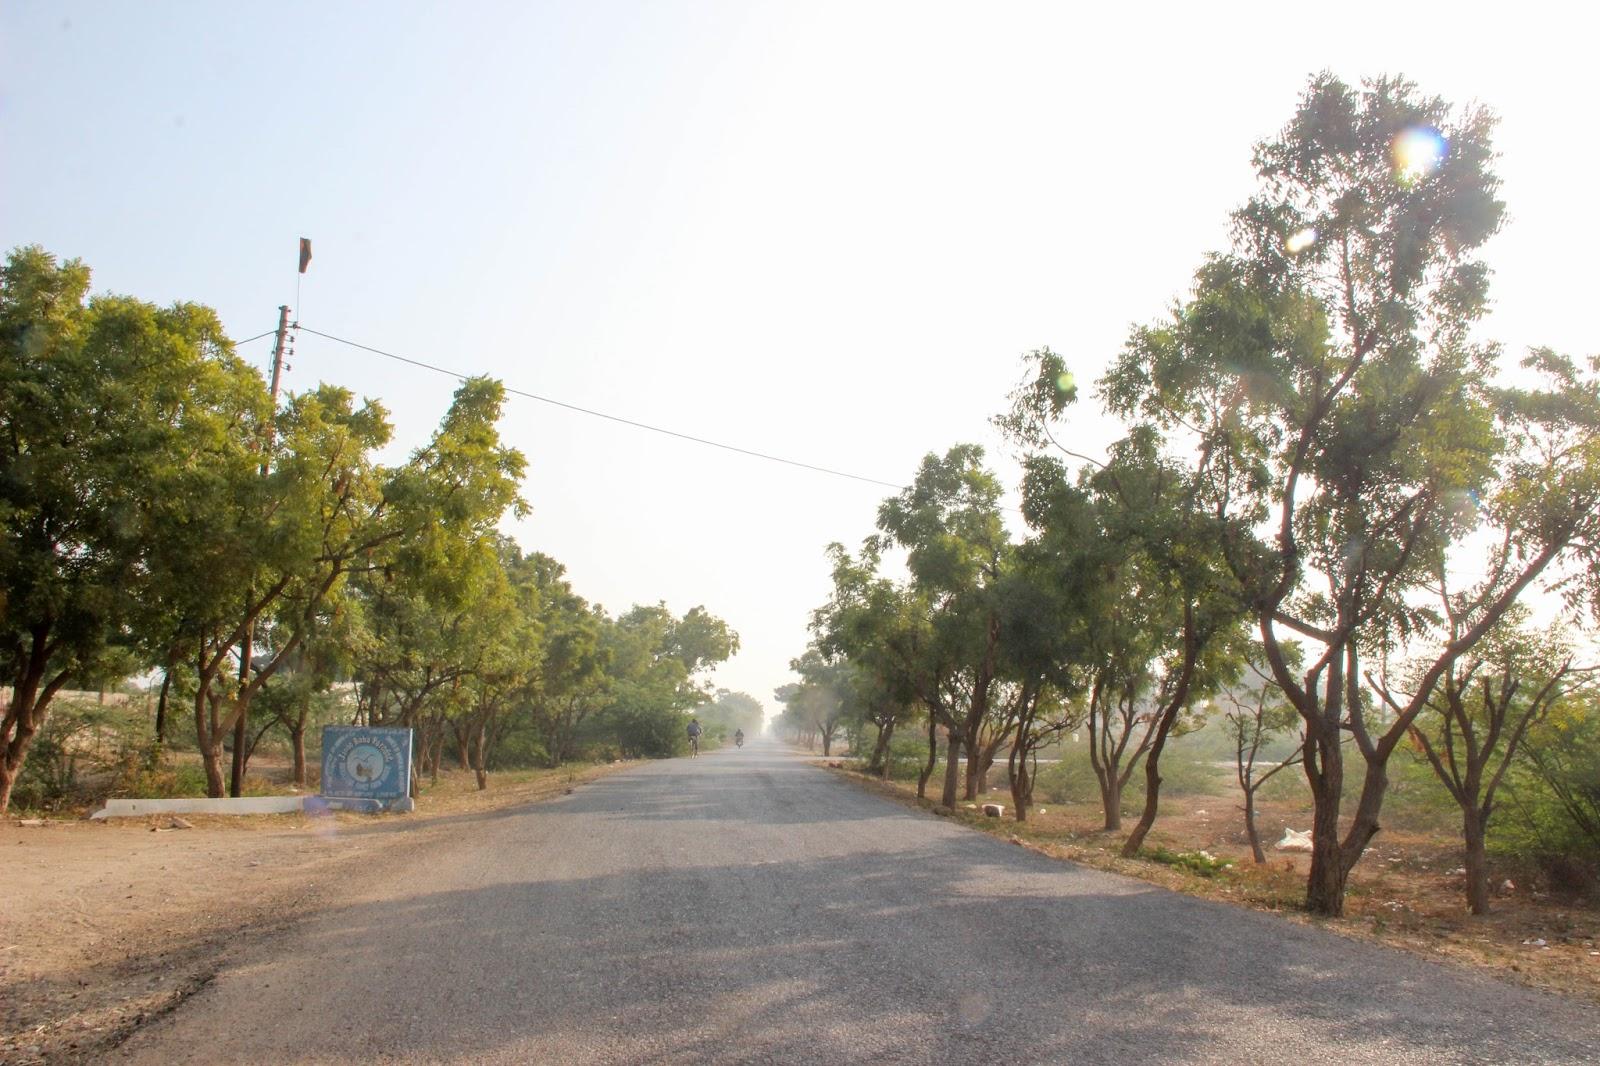 Kolachi Se Karachi: A Journey to Memon Goth, Damloti Wells